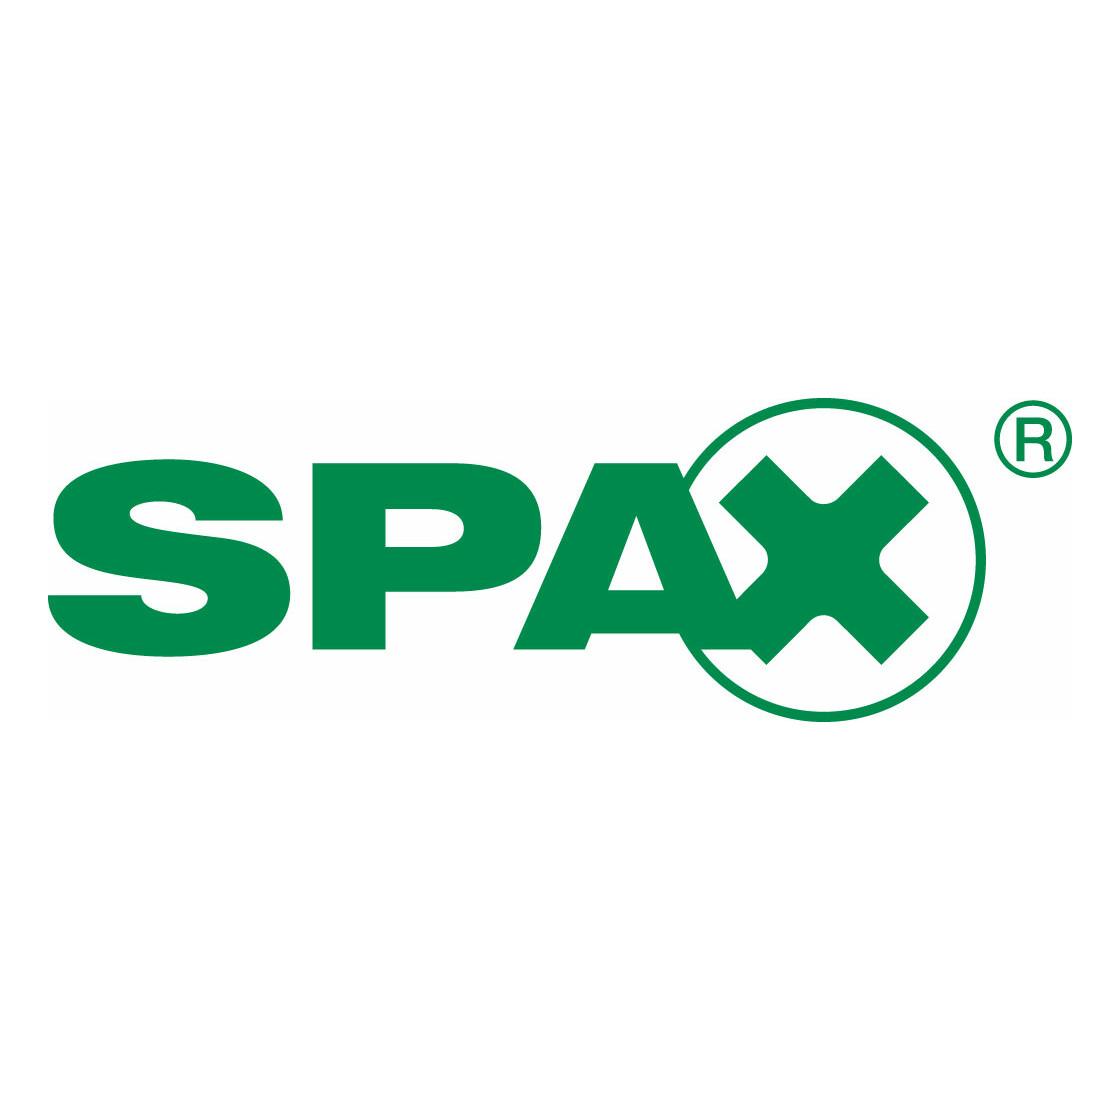 100 Stück SPAX Senkkopf T-STAR plus TG 5 x 70 Galvanisch blank verzinkt